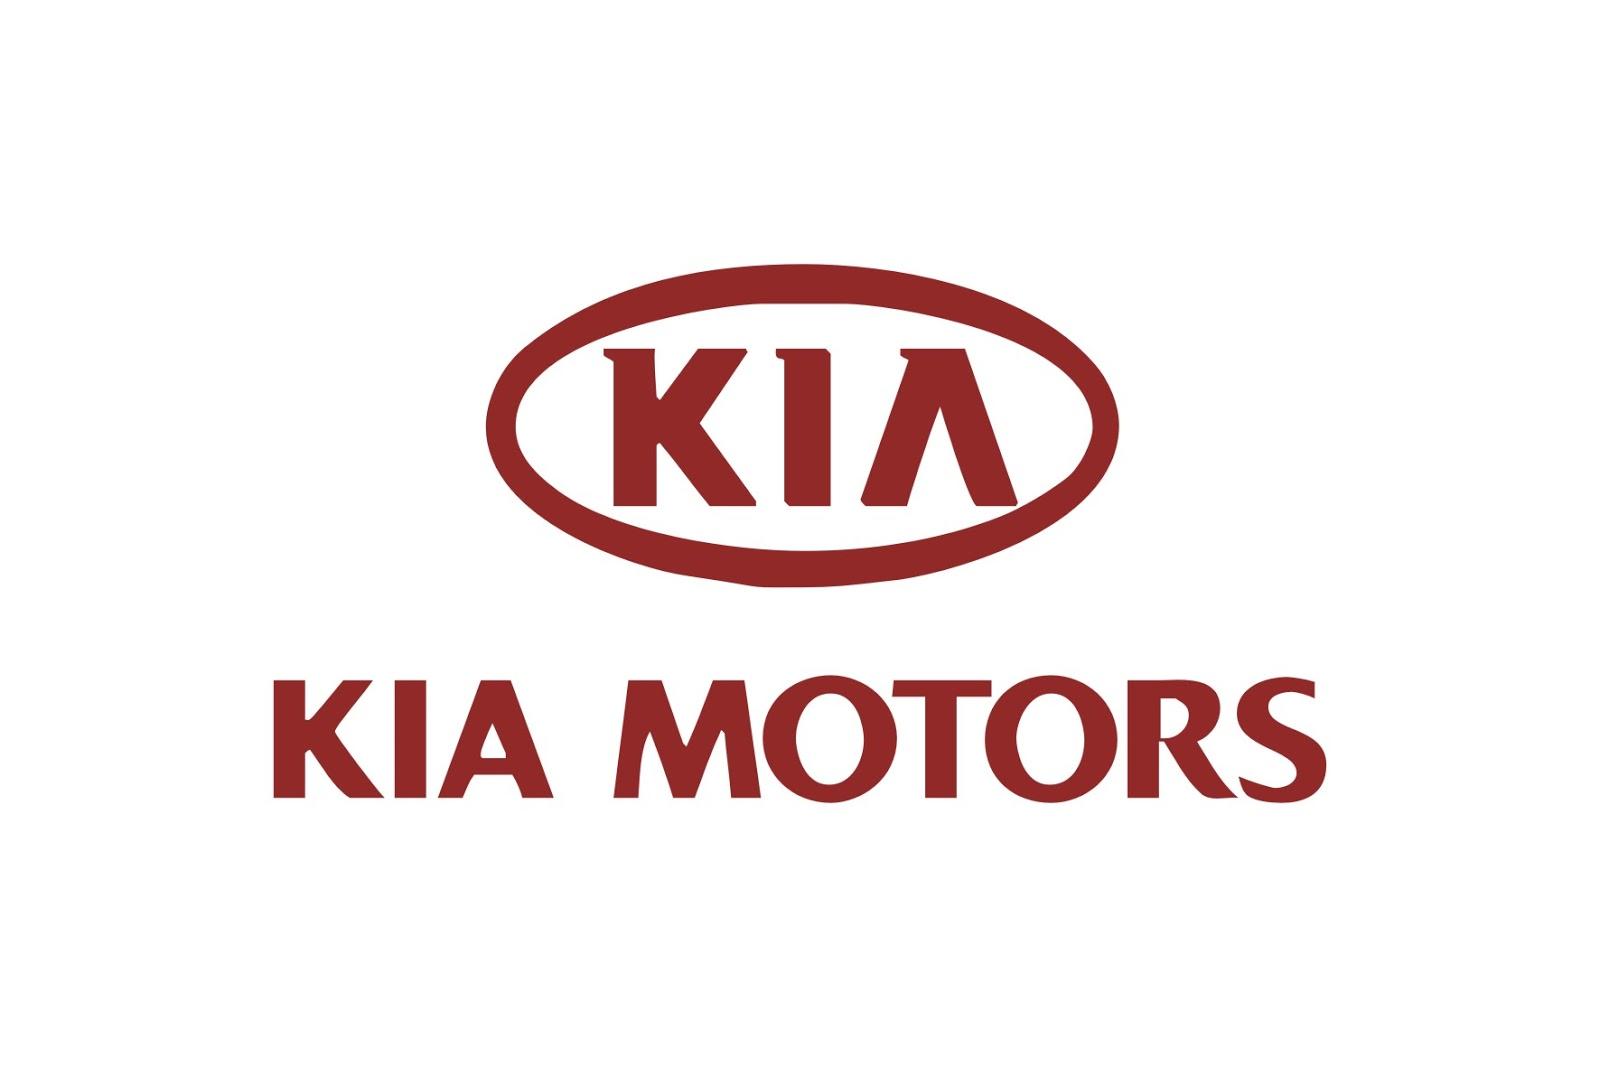 Kia motors logo logo share for Kia motors finance contact